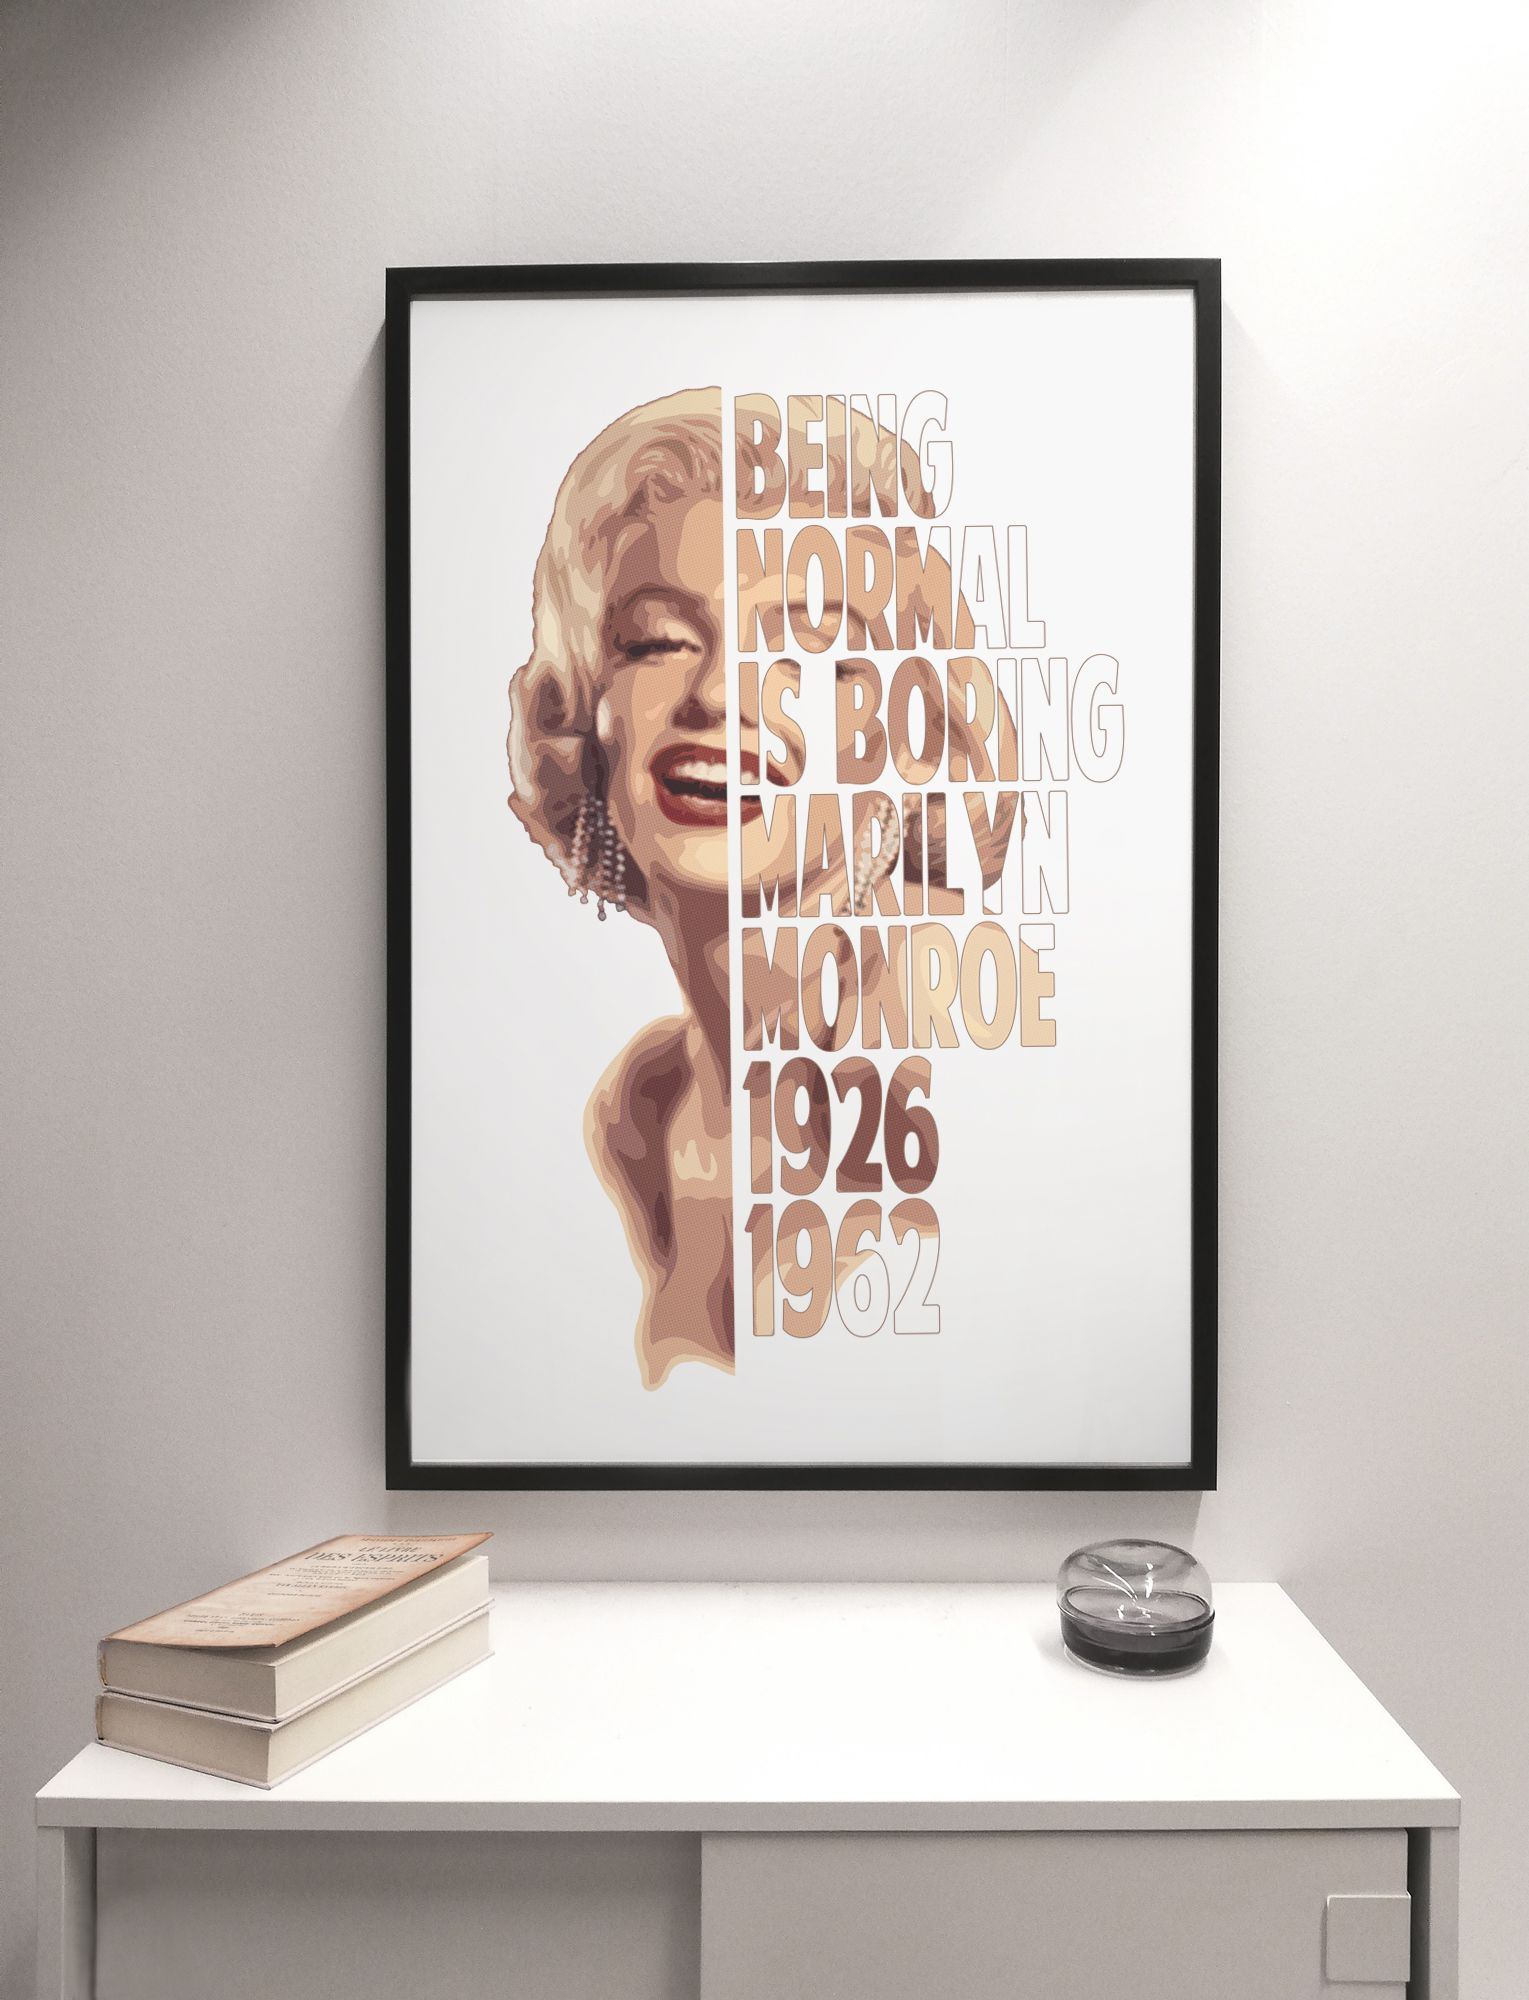 ACTRESS POSTER Marilyn Monroe Written Images